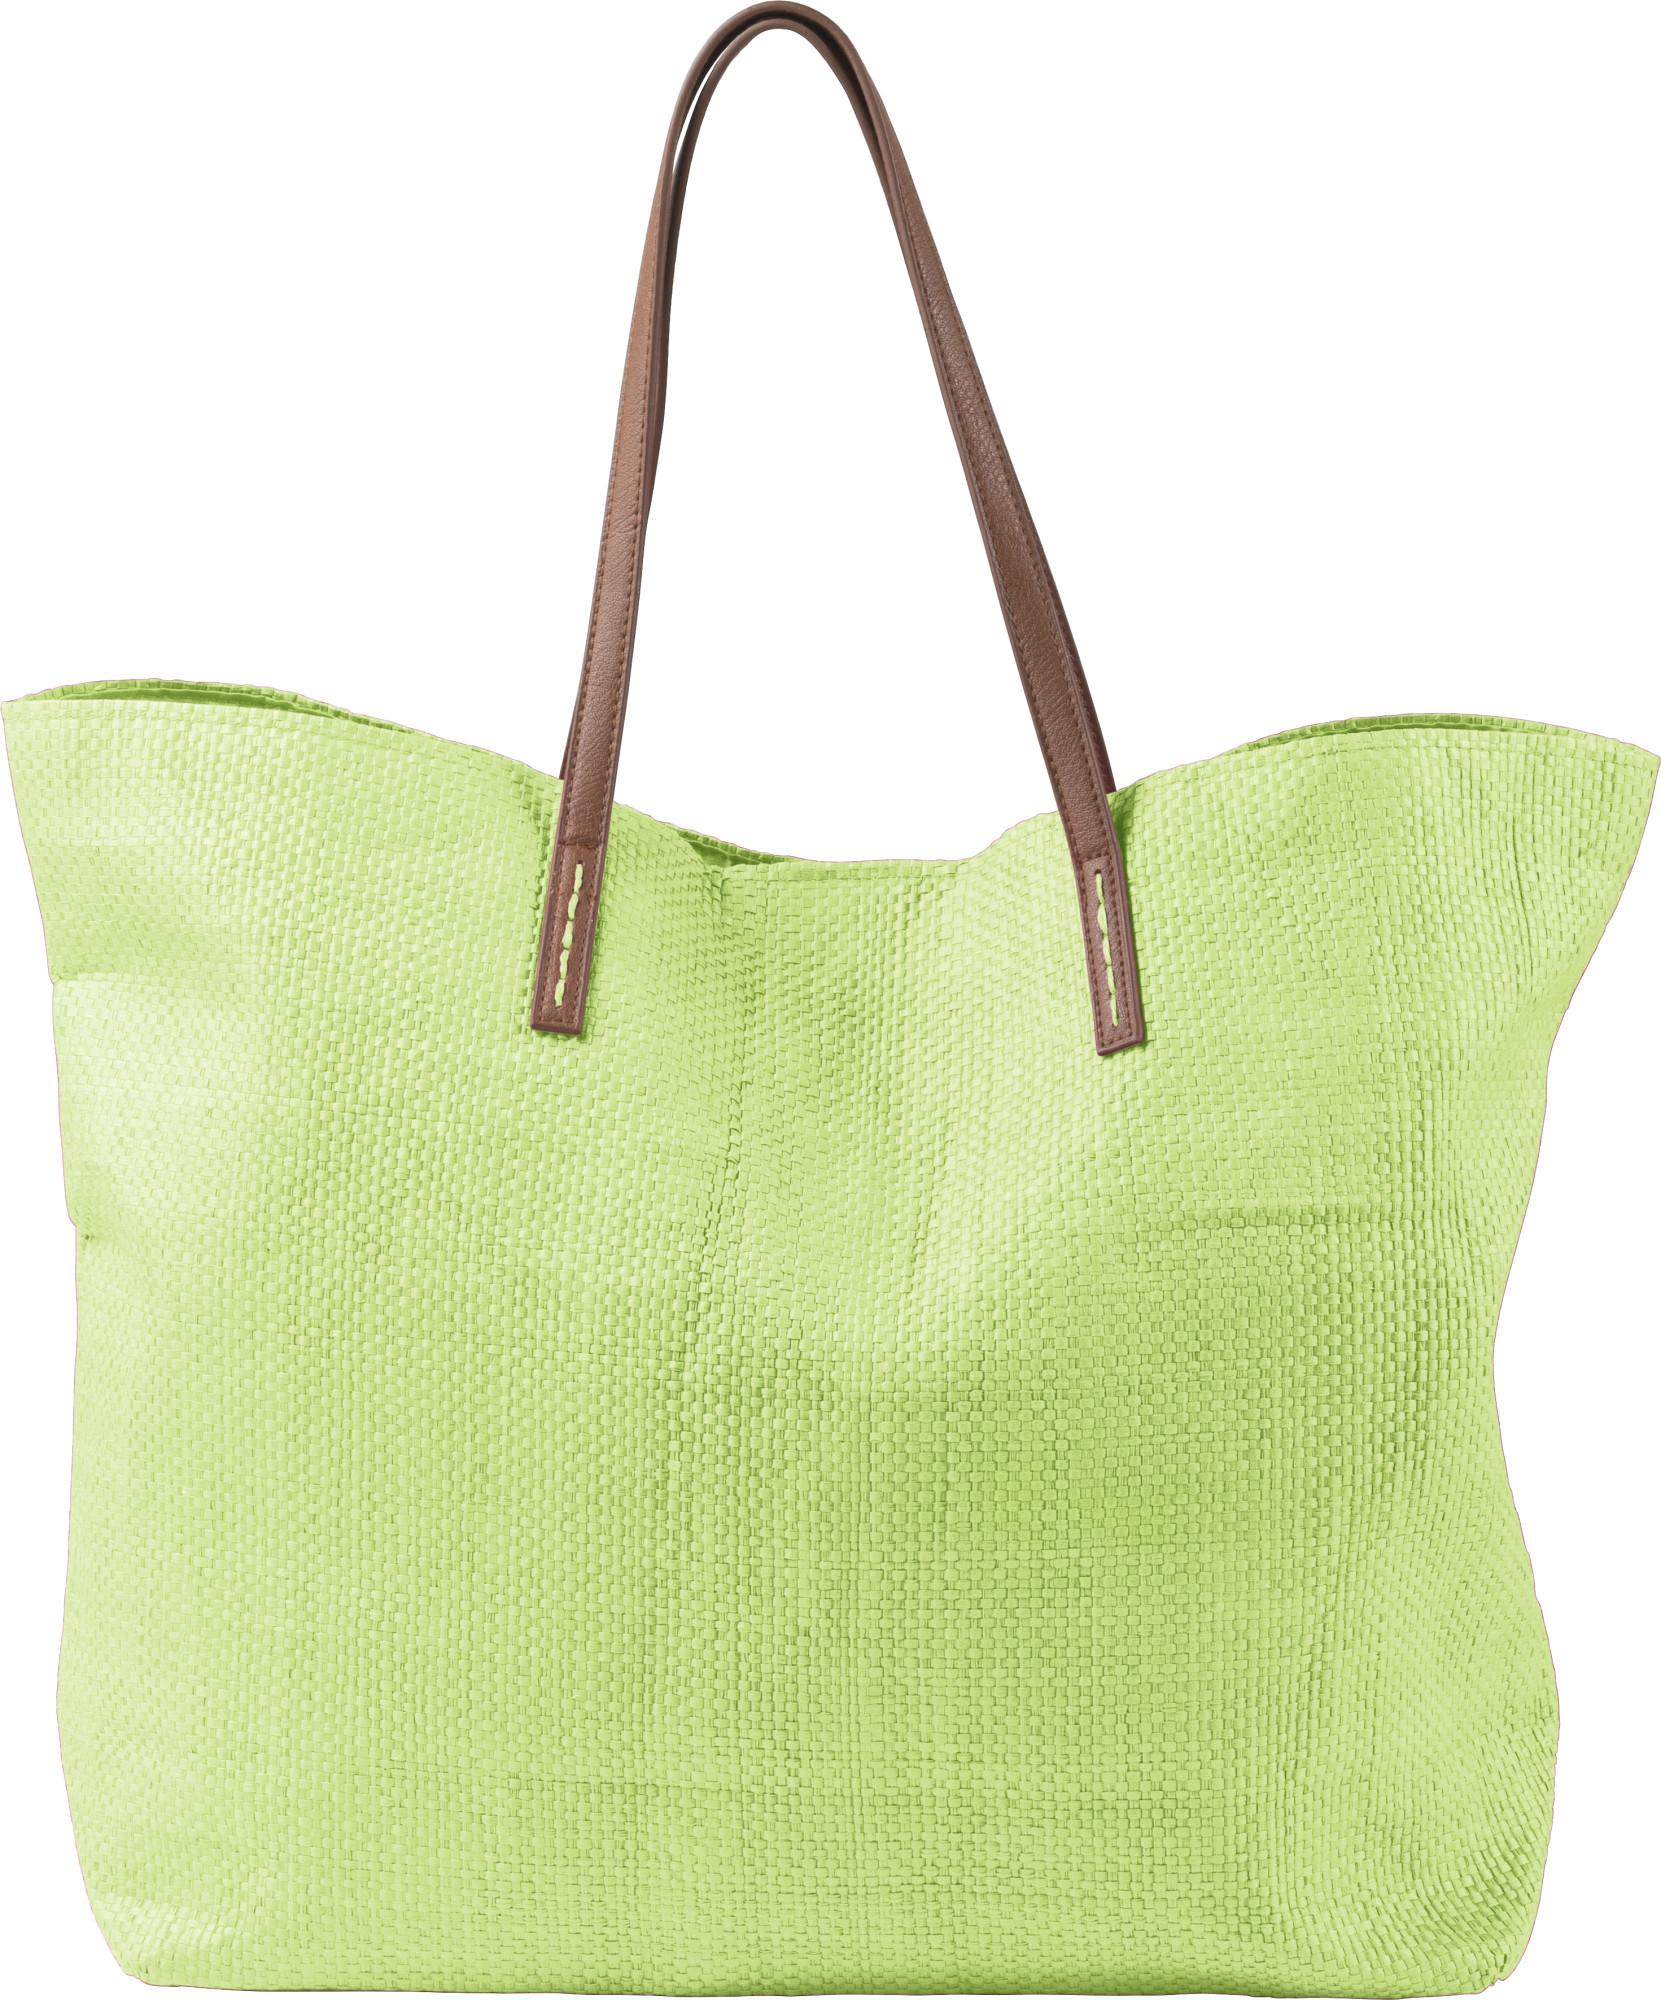 Sac shopping et plage en polyester - 19-1249-23